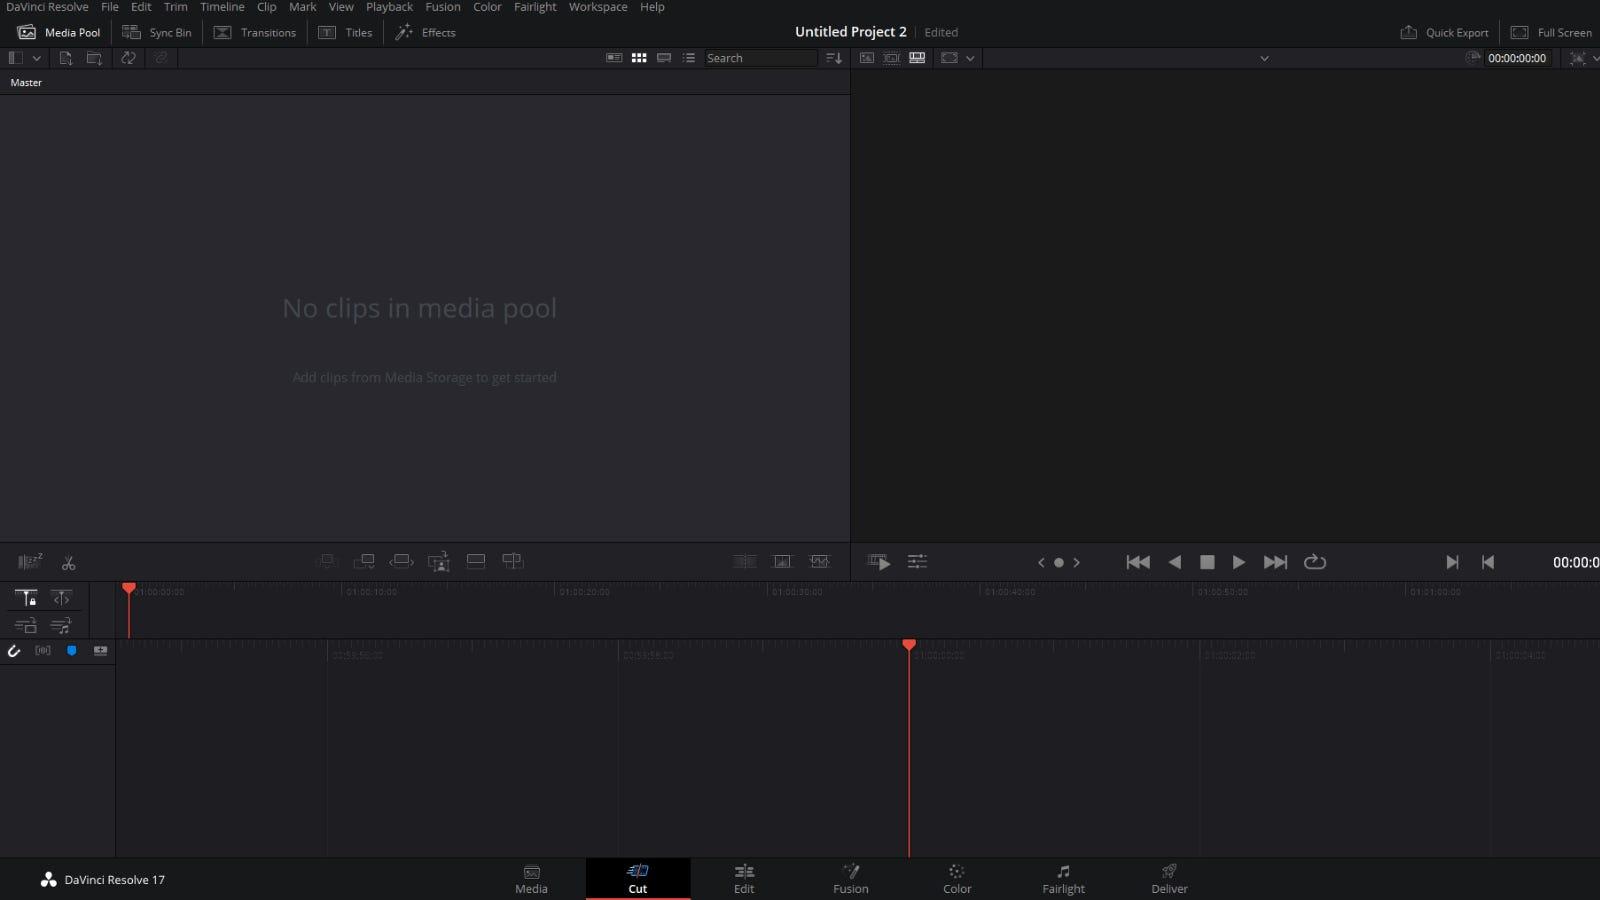 DaVinci Resolve 17 main editing window